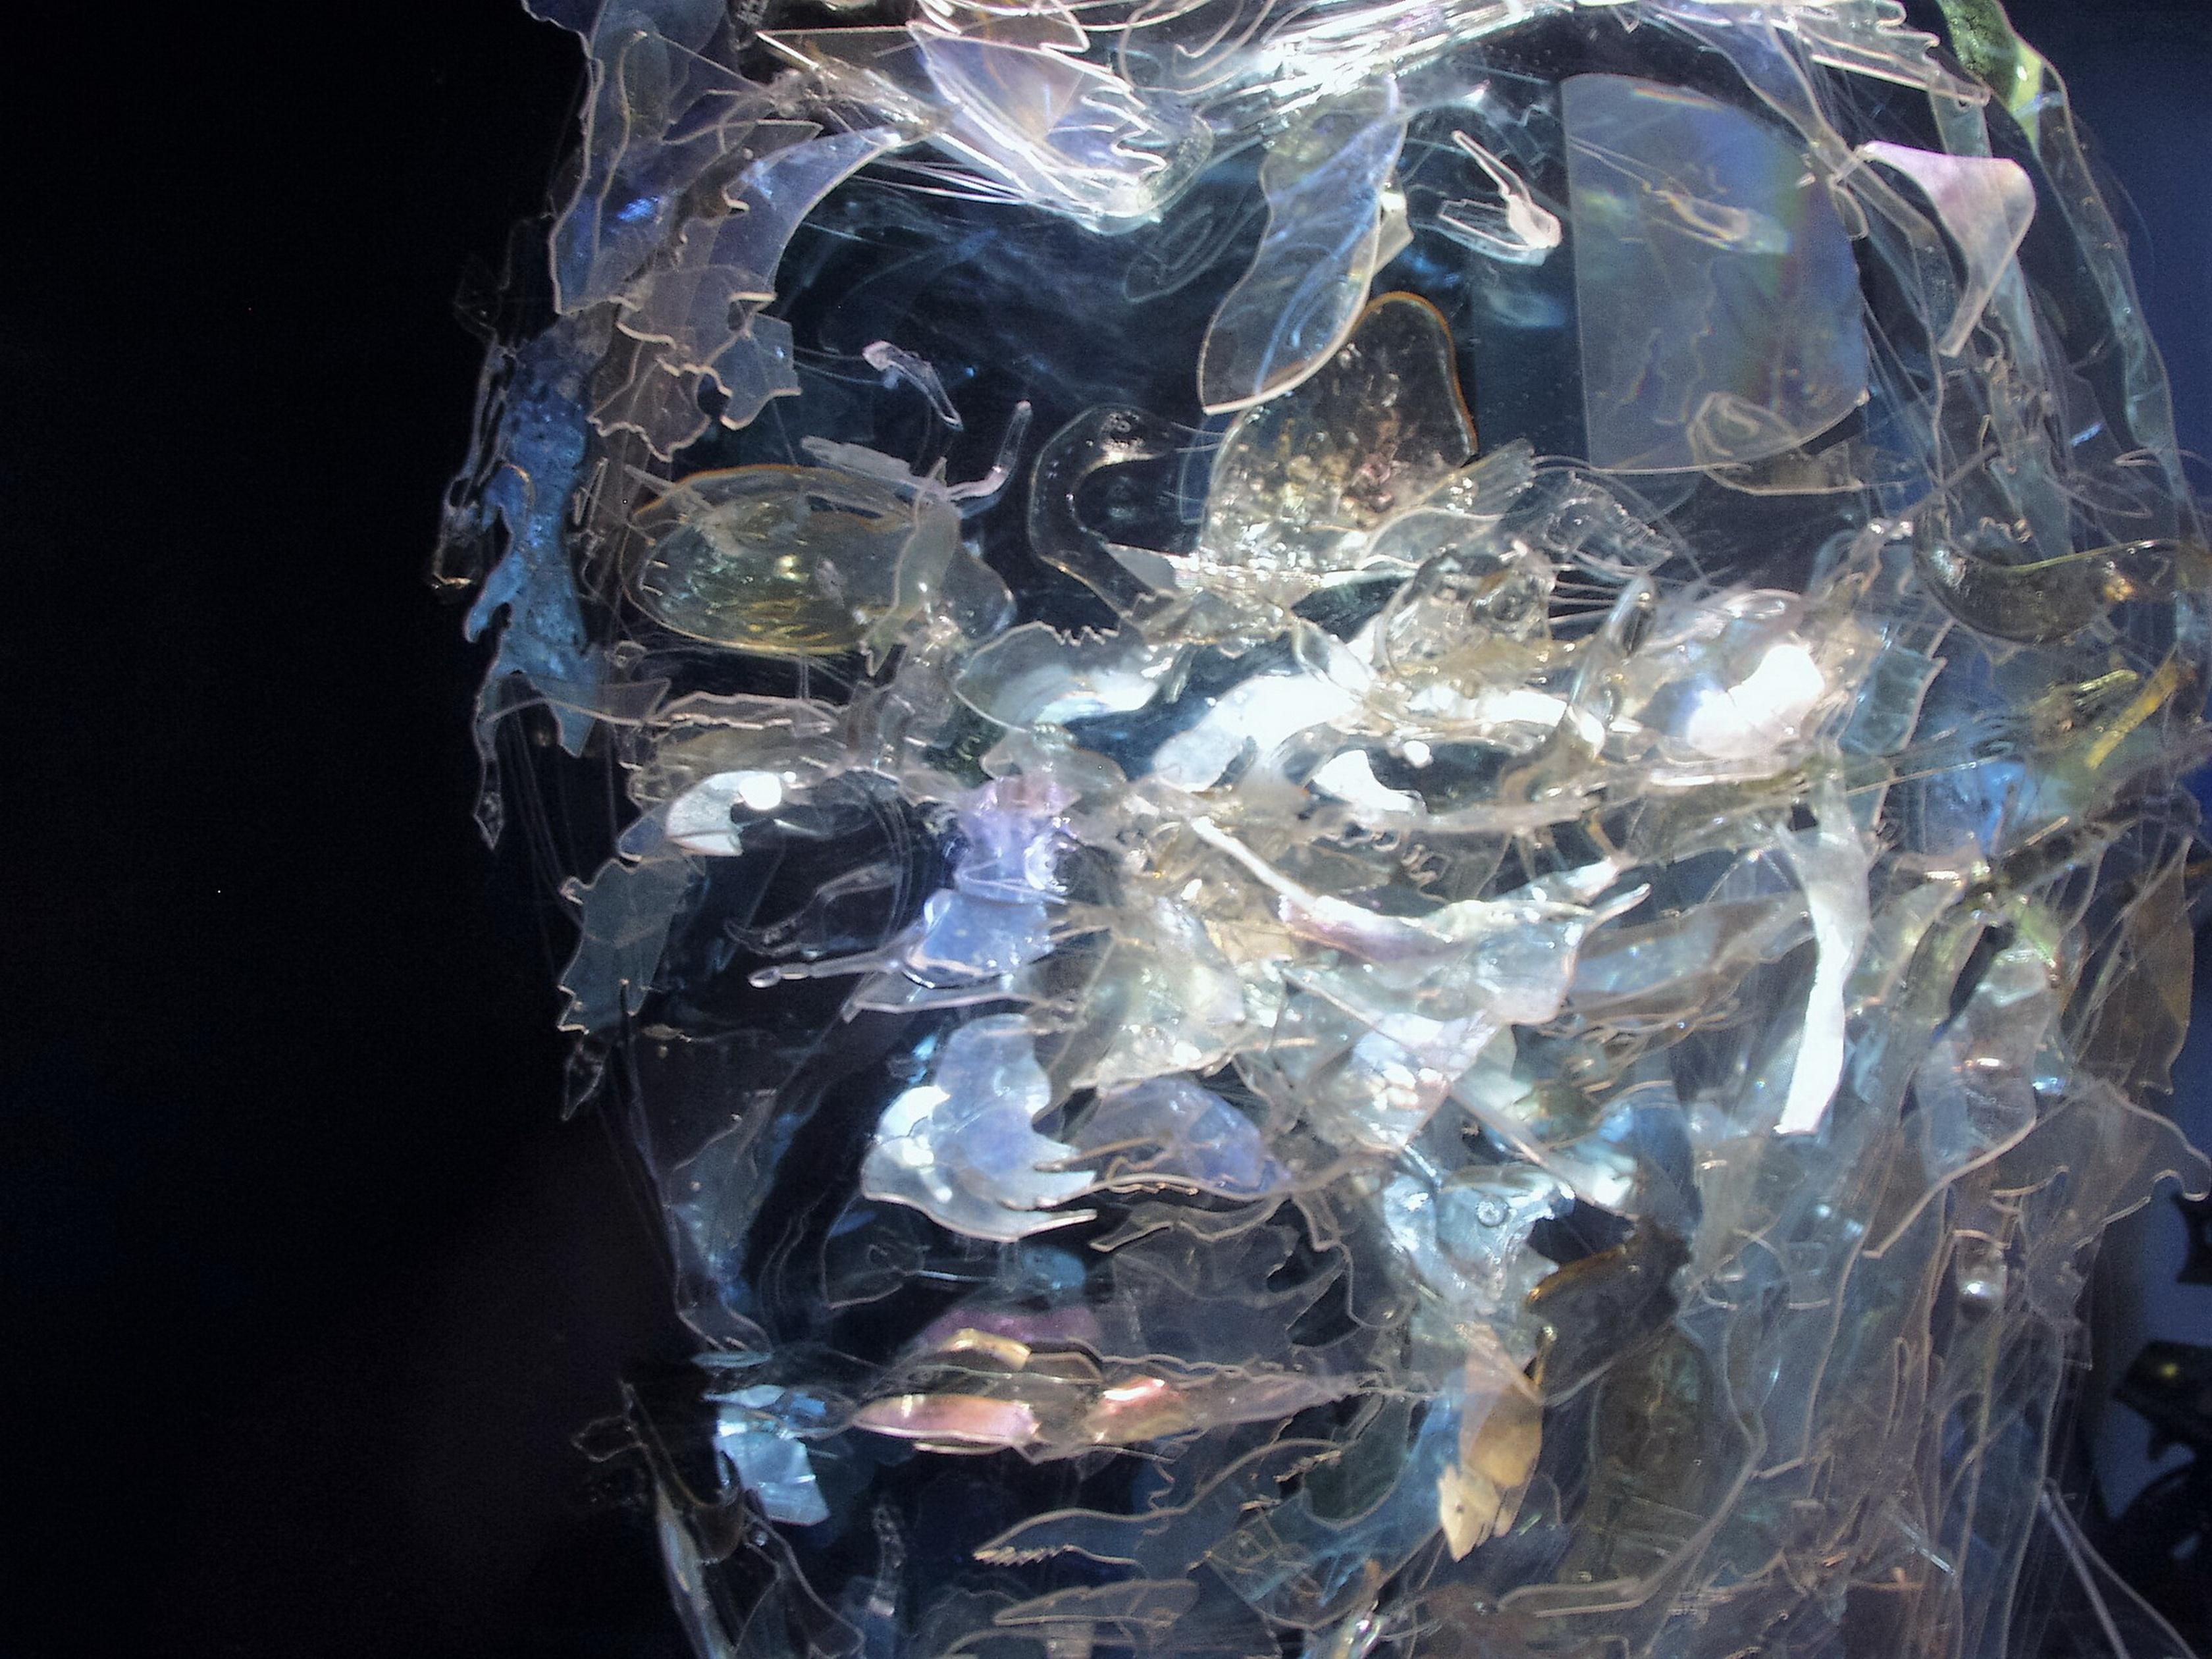 Maurizio Aprea - The hunter - Endosculpture